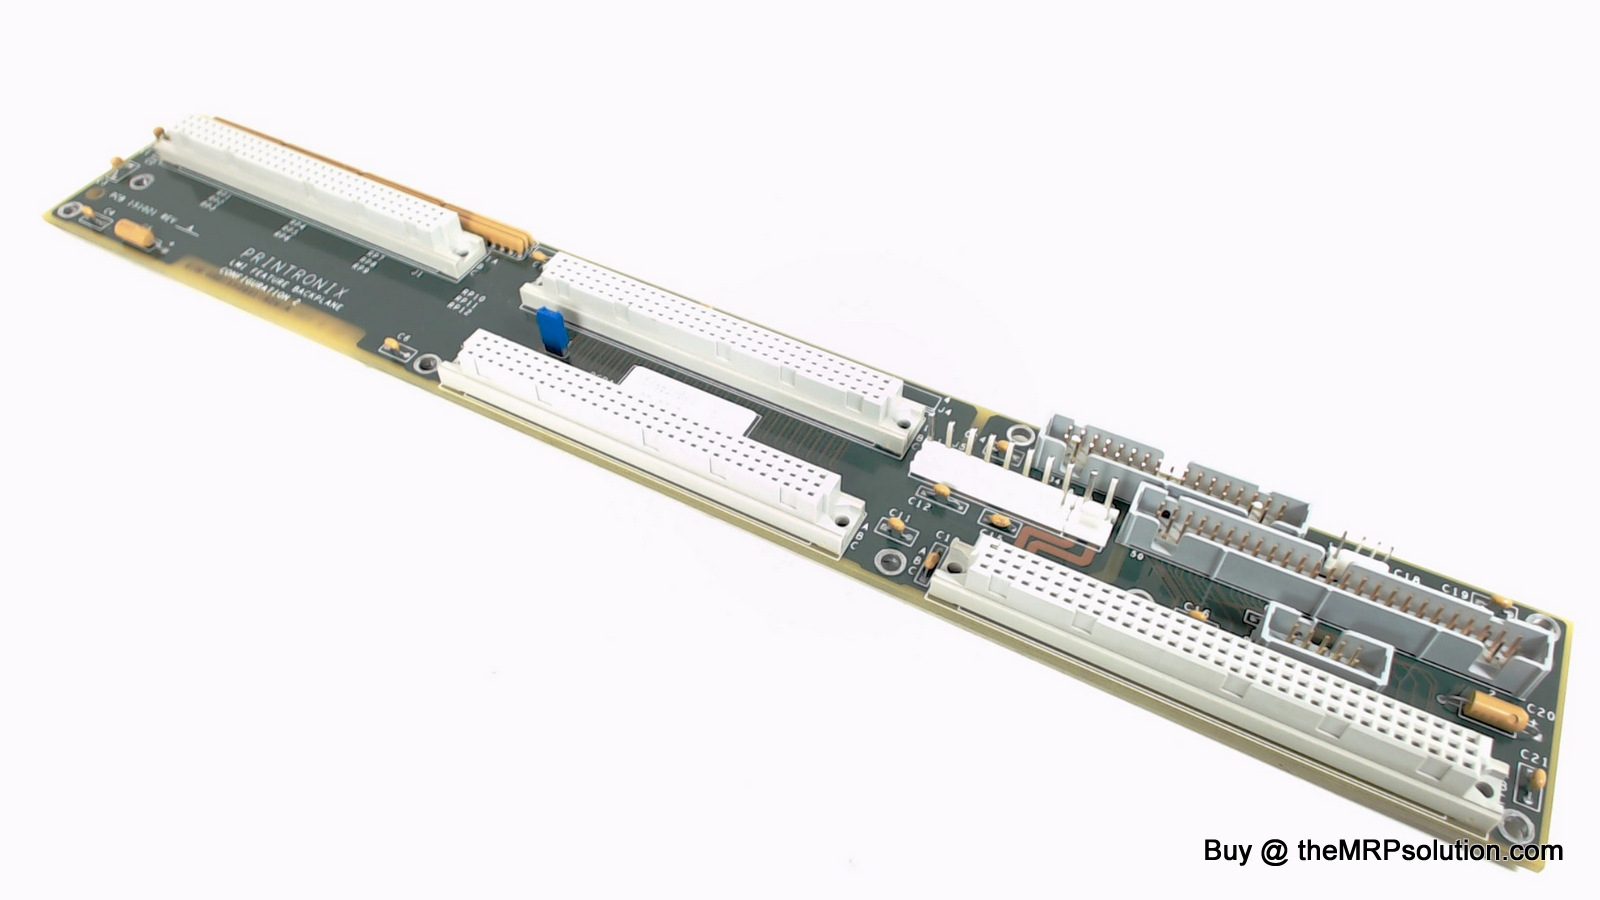 PRINTRONIX 150863-001 LMI BACKPLANE, P4280 Refurbished